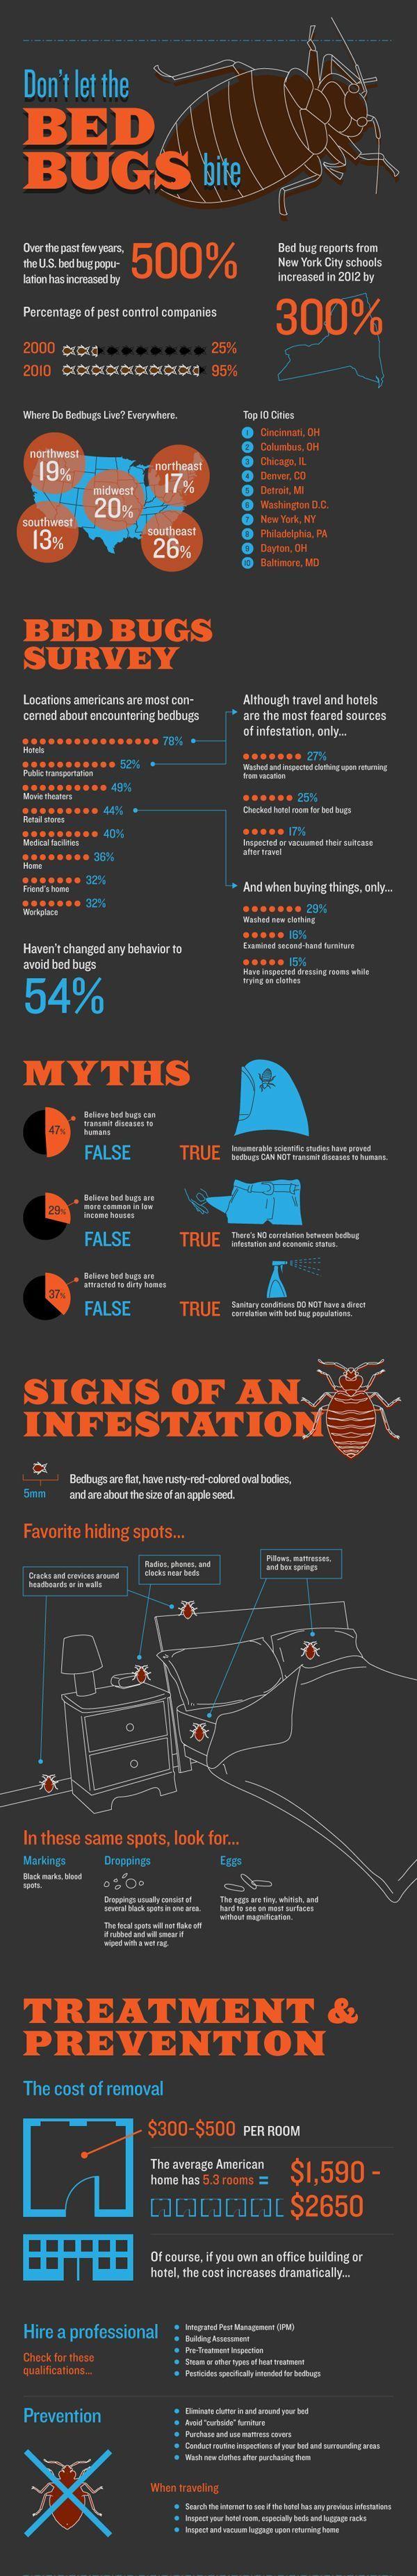 0f1c01fdbe94bc491d6954f58a408405 - How To Get Rid Of Bed Bugs While Backpacking